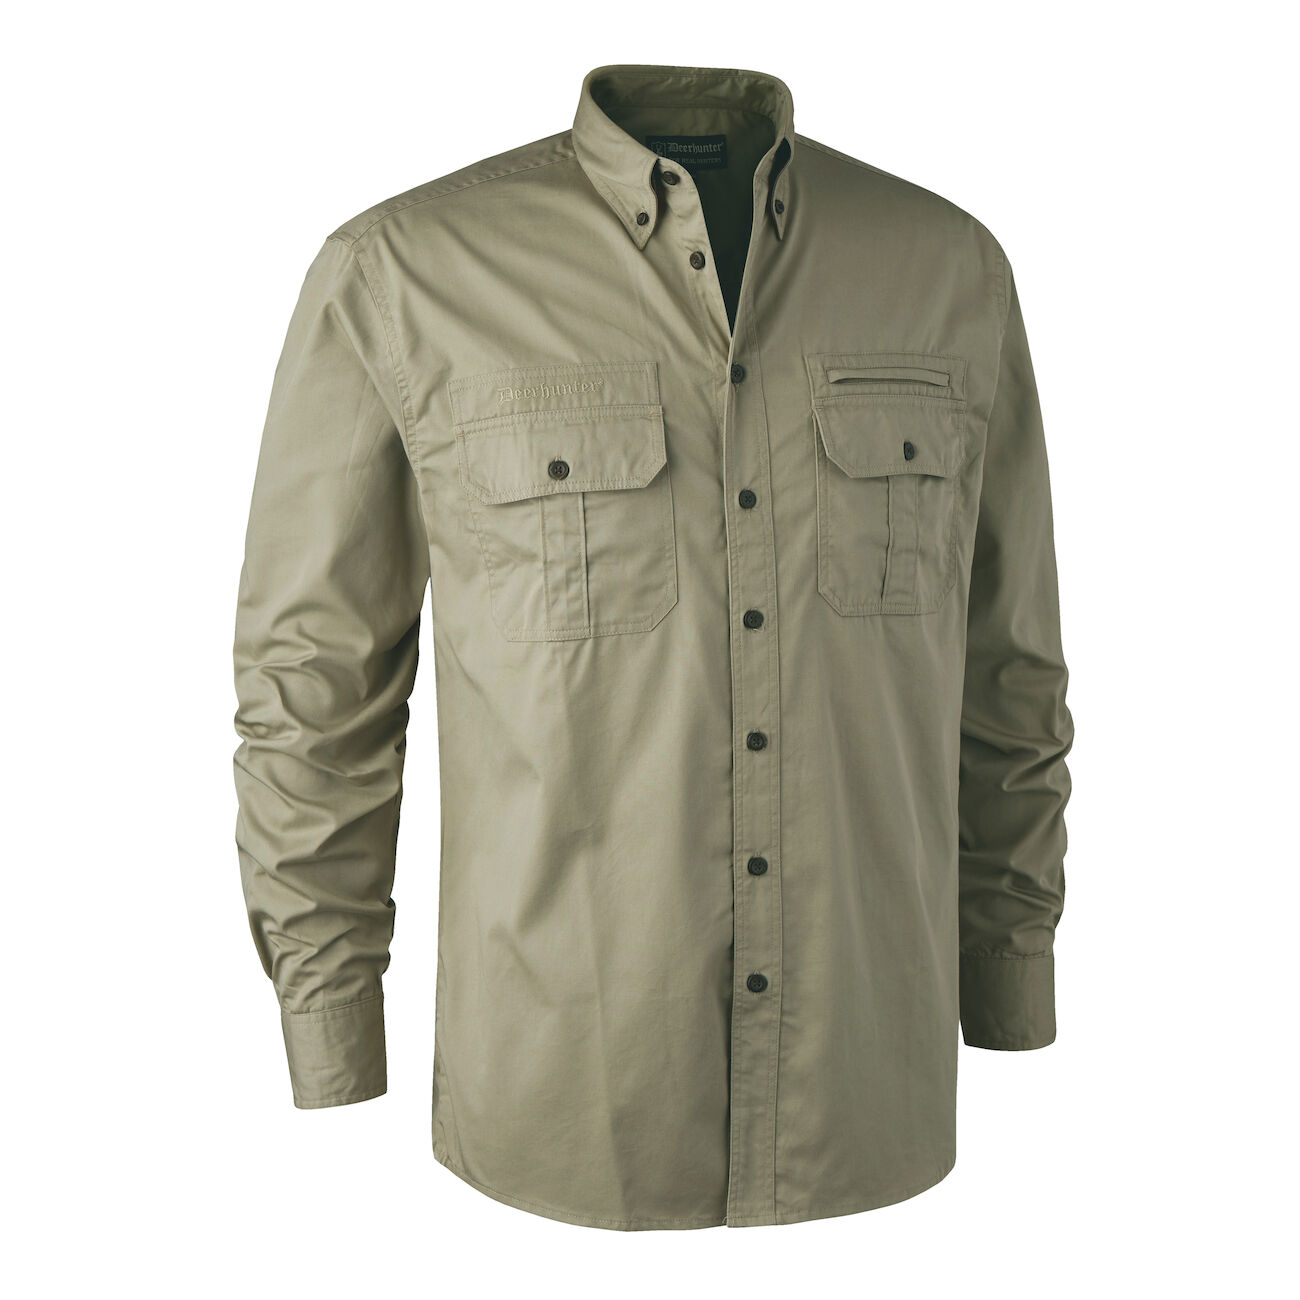 Fallen Leaf Deerhunter Caribou Hunting Shirt S//S